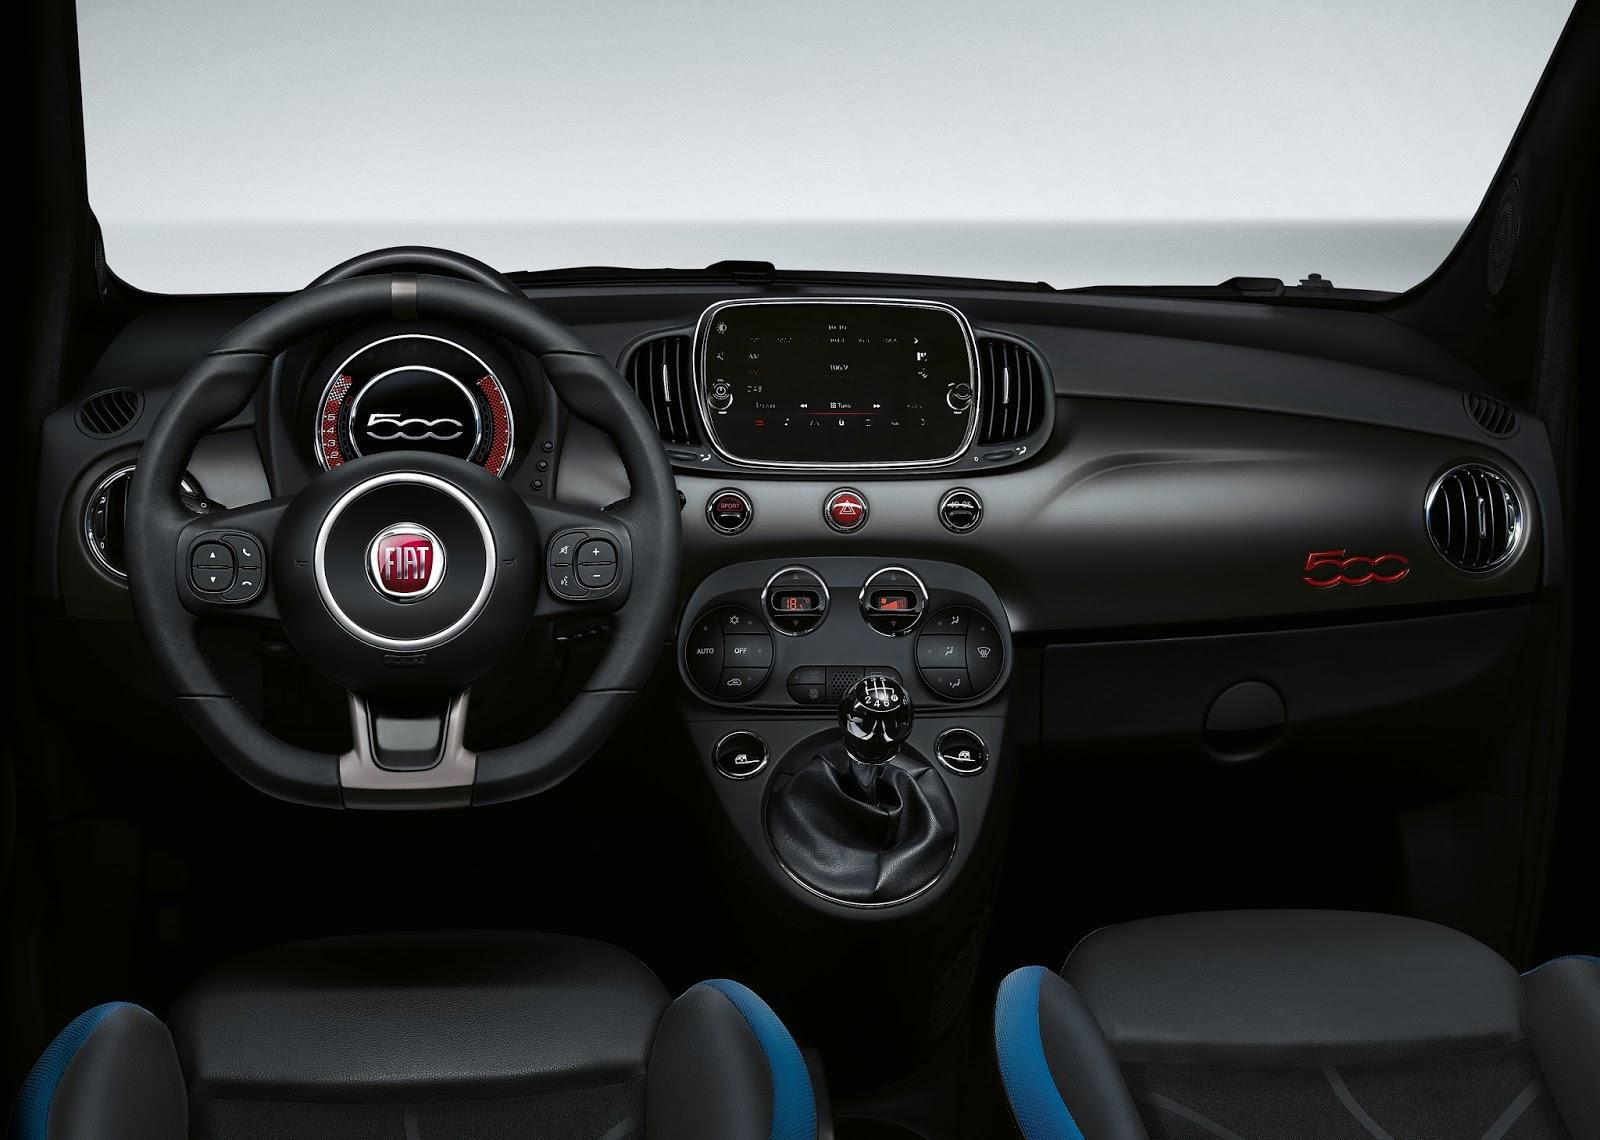 160301 Fiat 500s 06 Η Fiat με όλα τα μέλη της οικογένειας της, στην έκθεση αυτοκινήτου 2016 στο Παρίσι autoshow, Fiat, fiat 124 spider, Fiat 500, Fiat 500 Riva, Fiat 500S, Fiat 500X